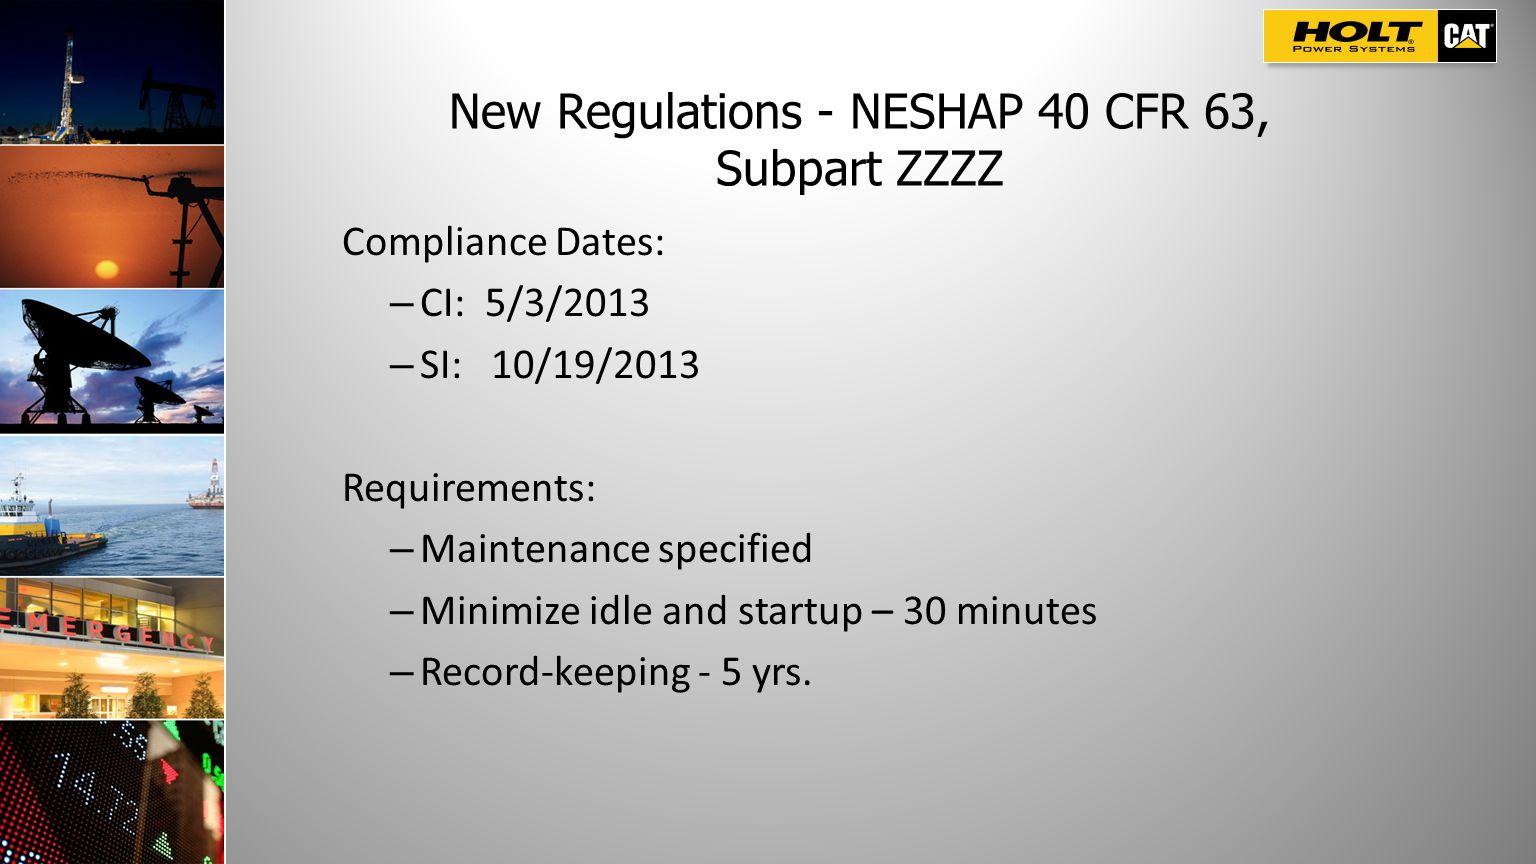 New Regulations - NESHAP 40 CFR 63, Subpart ZZZZ